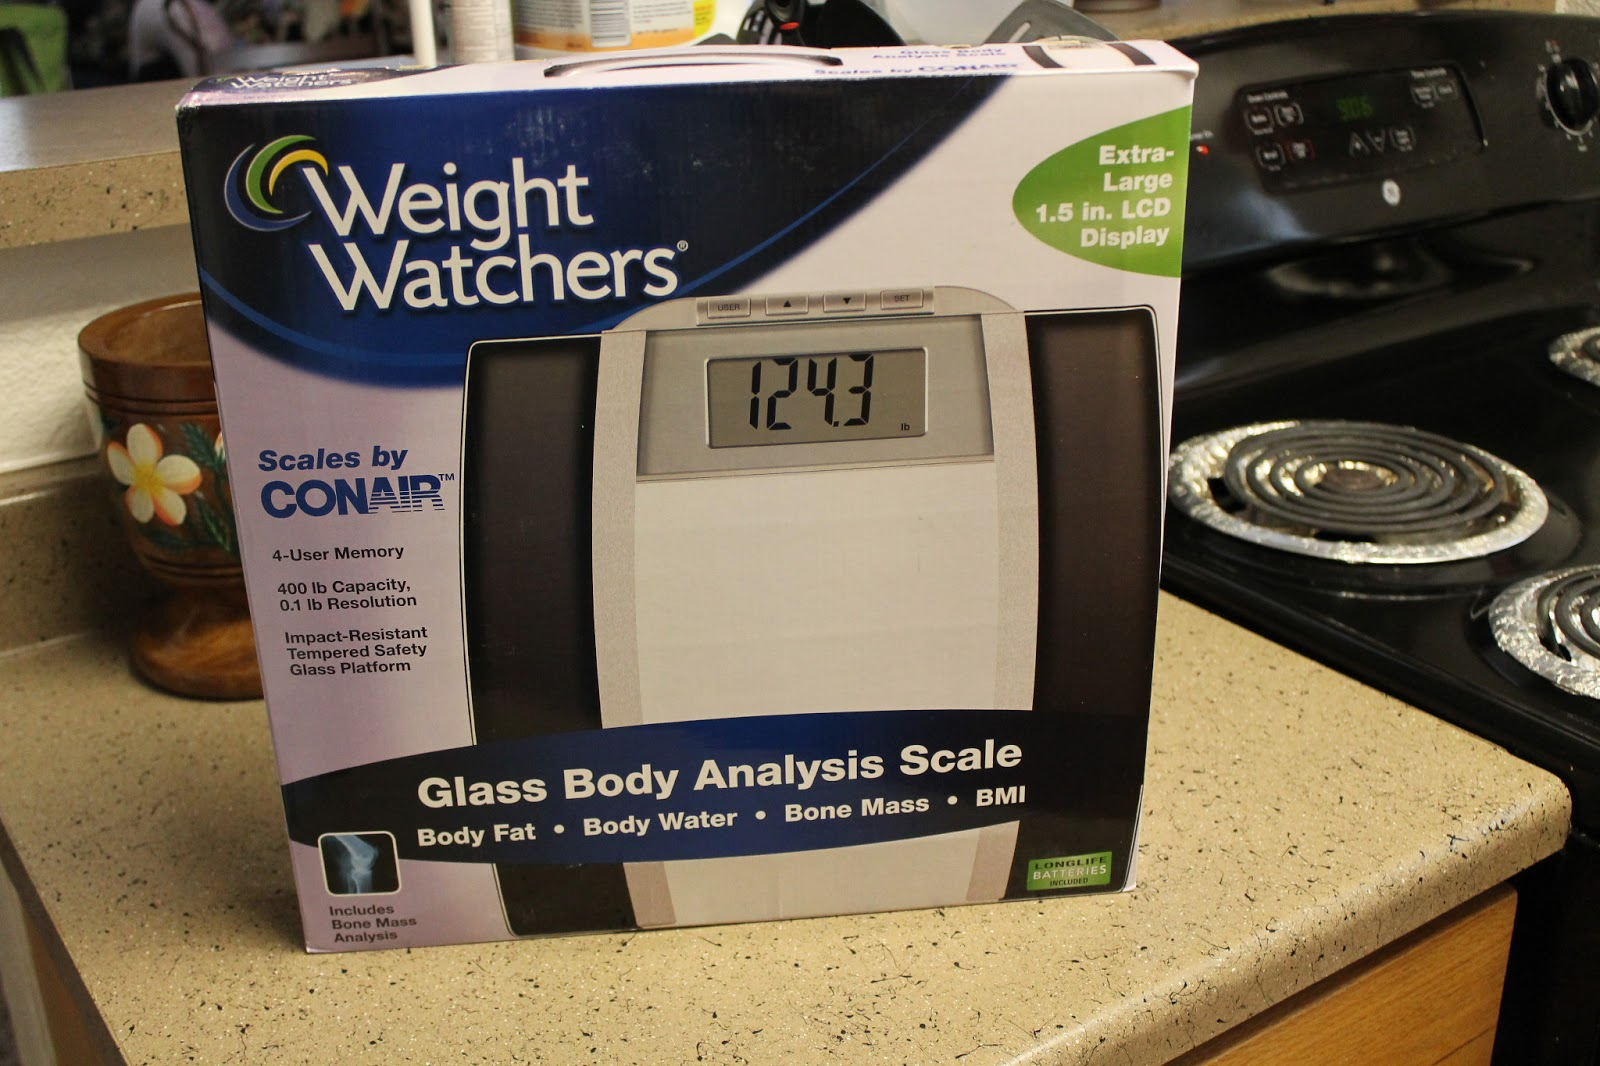 Weight Watchers By Conair Gl Body Ysis Scale Model Ww78